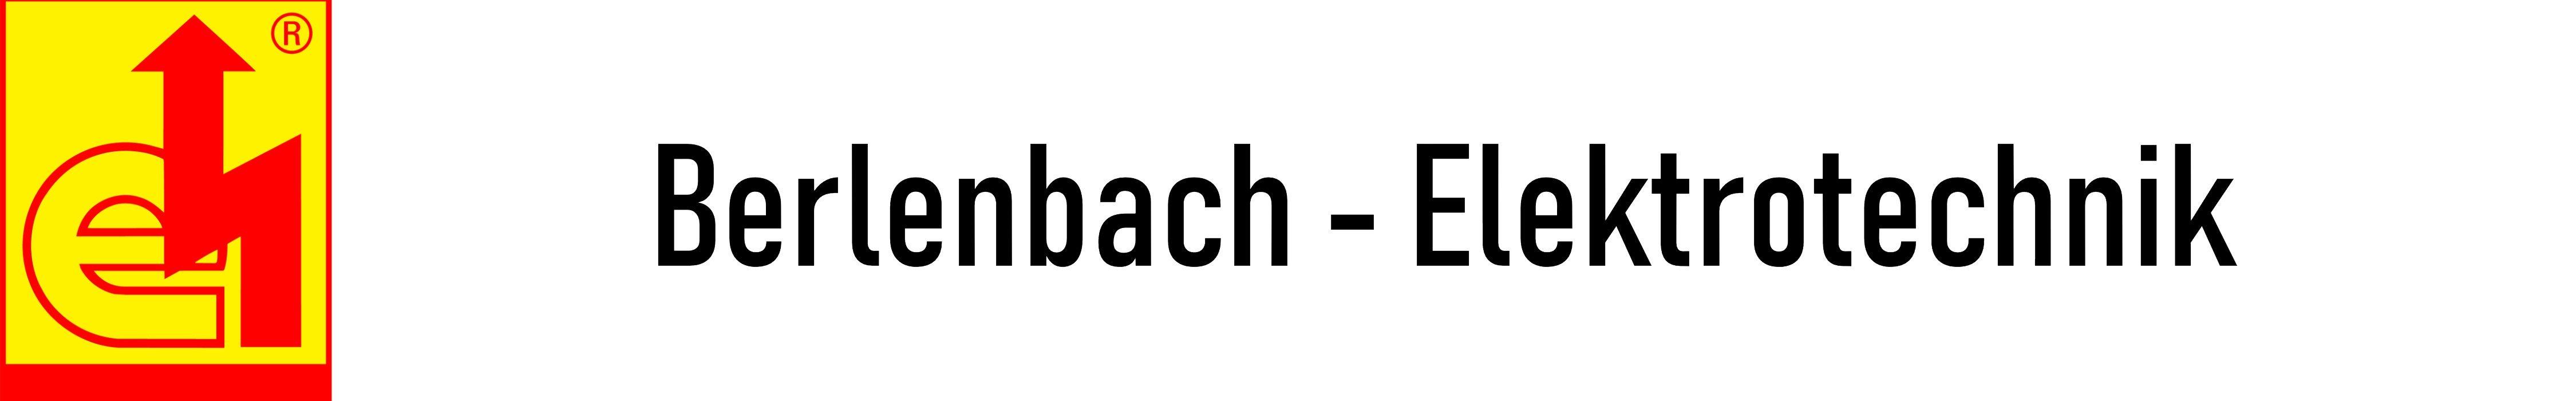 berlenbach-elektrotechnik.de